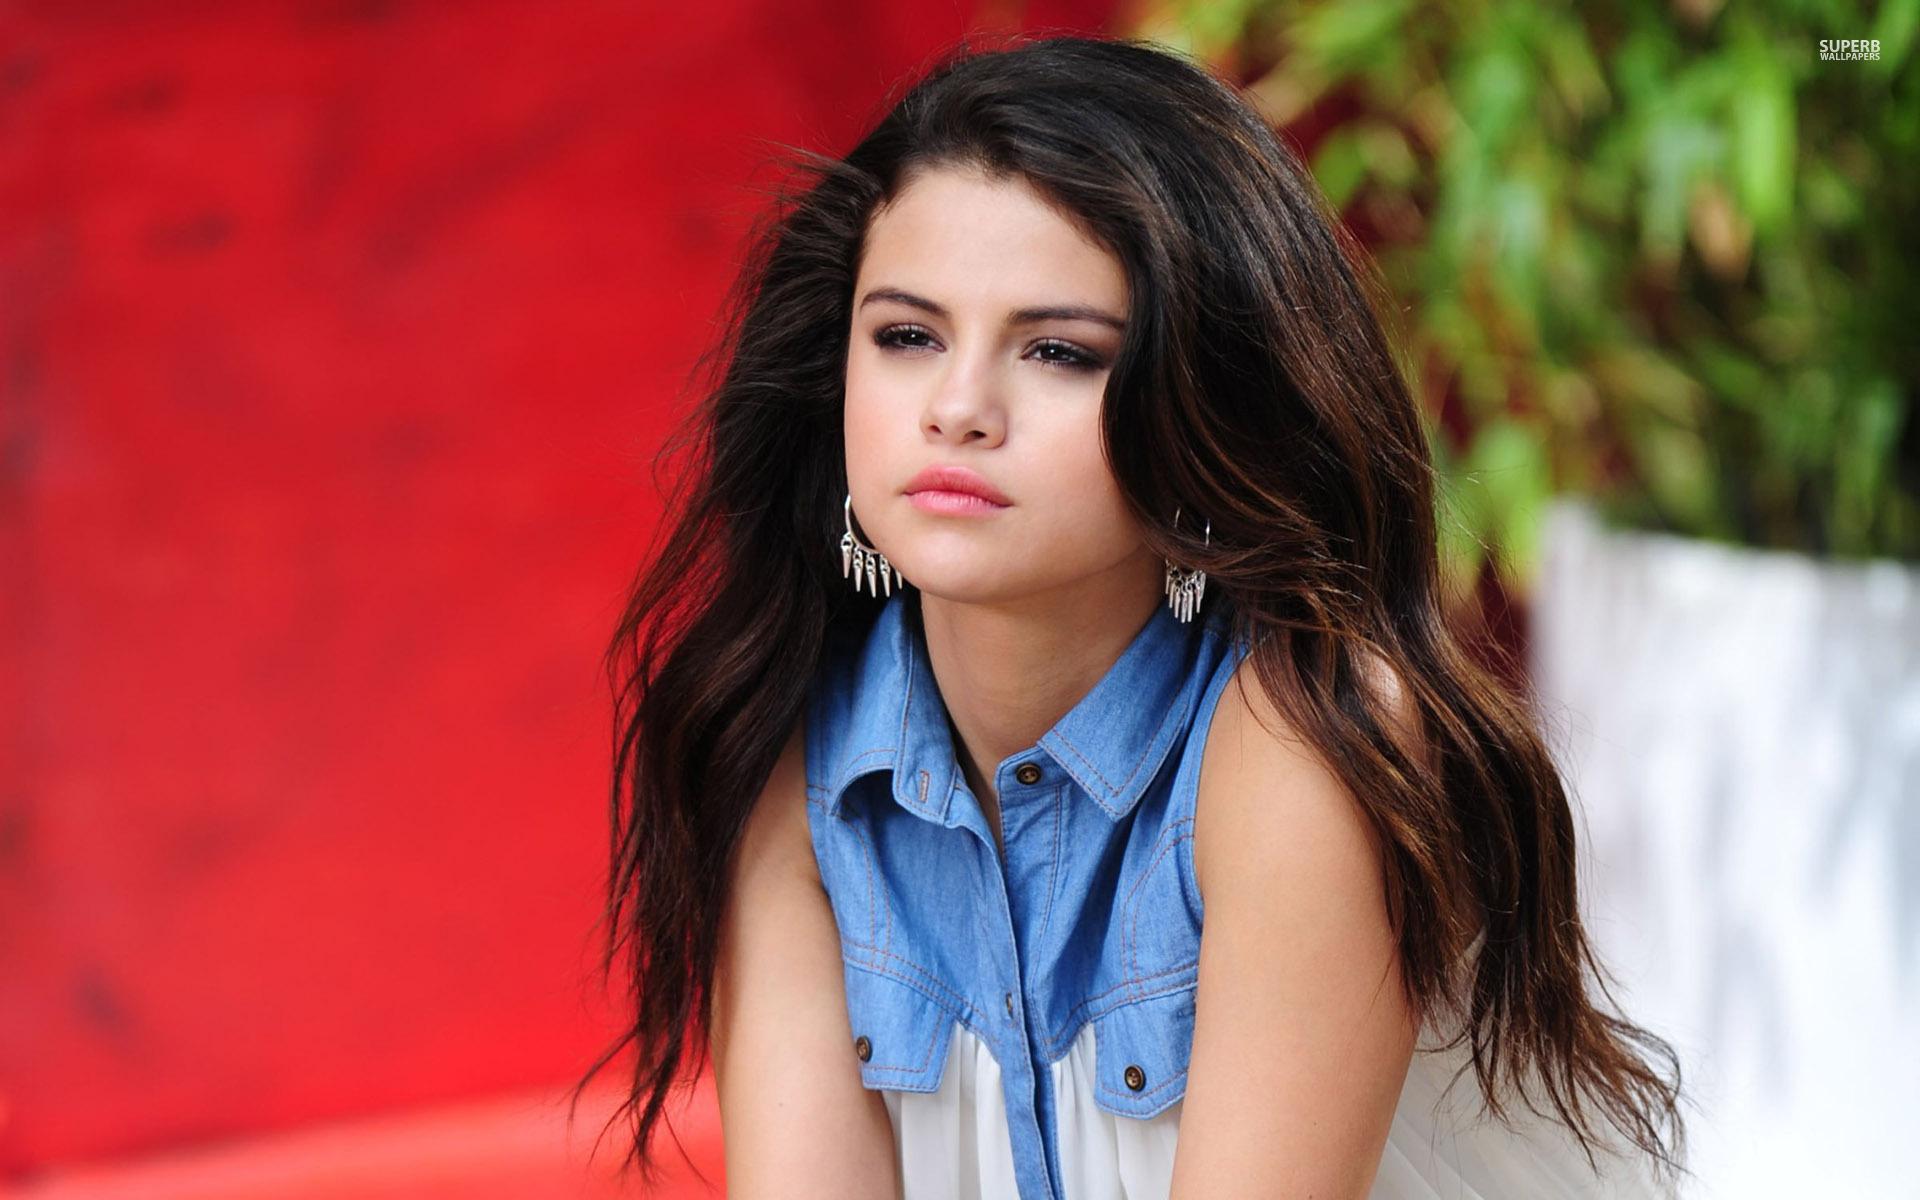 Selena Gomez Widescreen Wallpaper Related Keywords 1920x1200